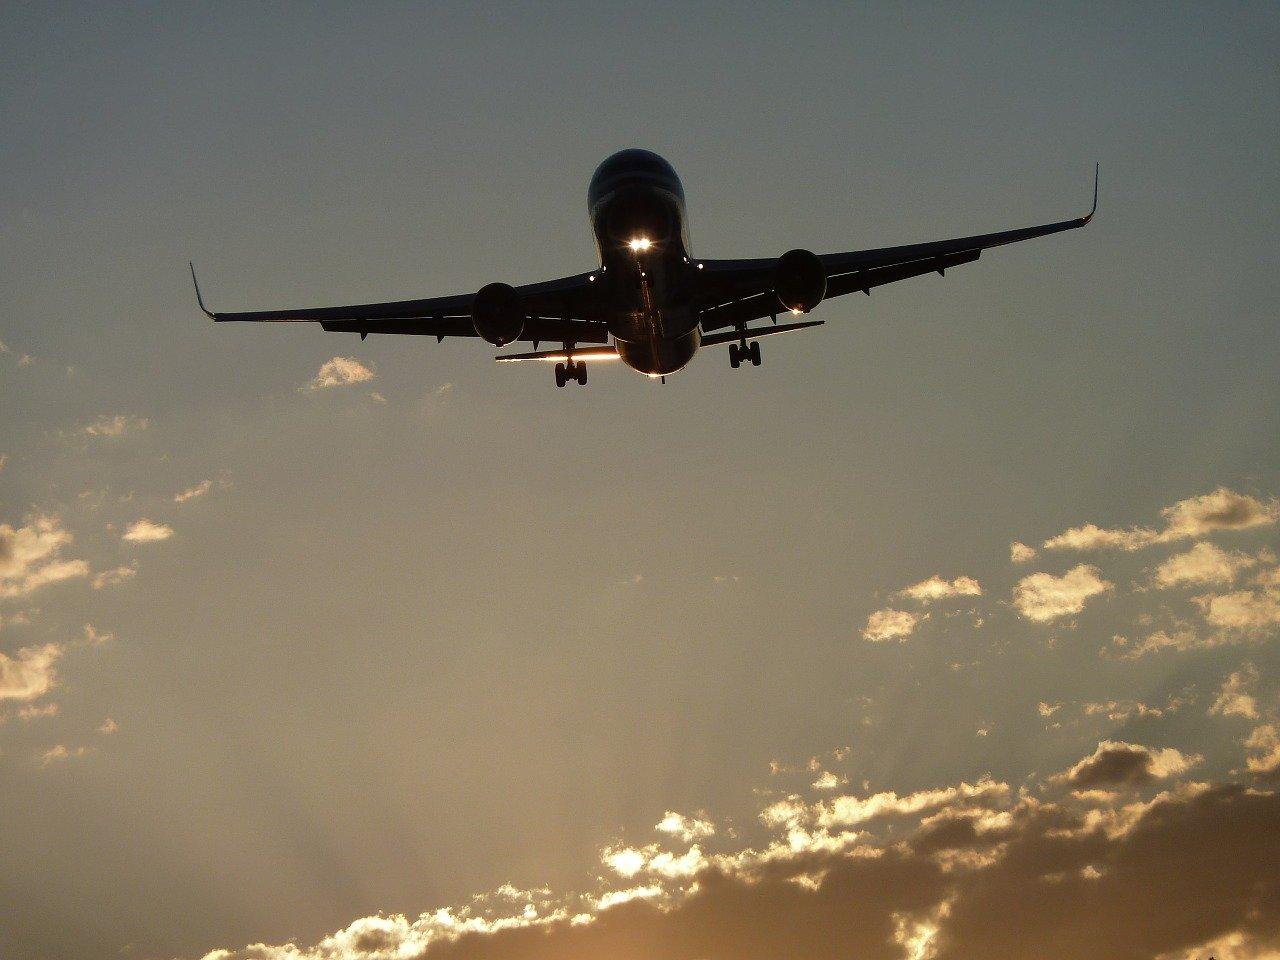 Boeing va supprimer davantage de postes